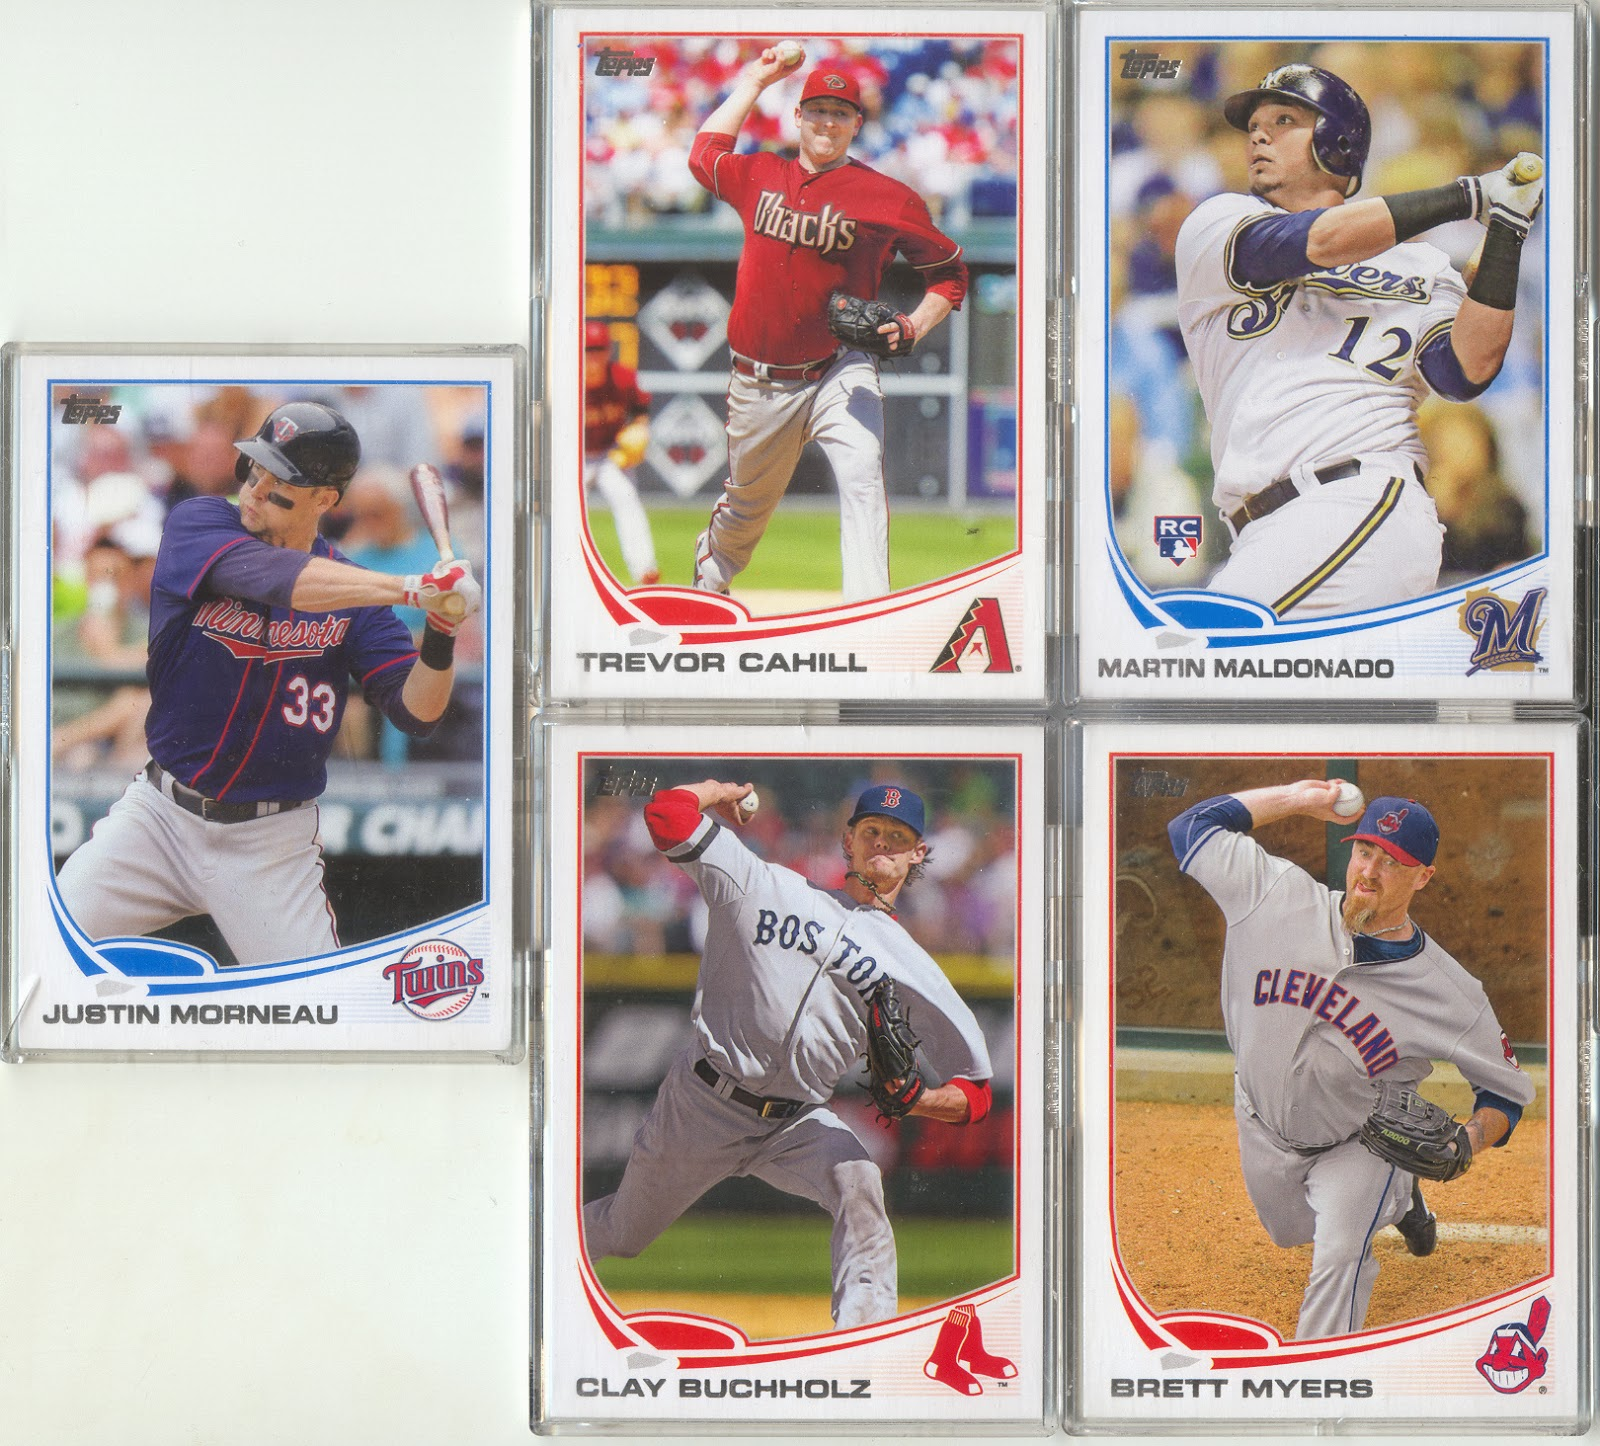 bdj610\'s Topps Baseball Card Blog: A Very Colorful Christmas or Yes ...